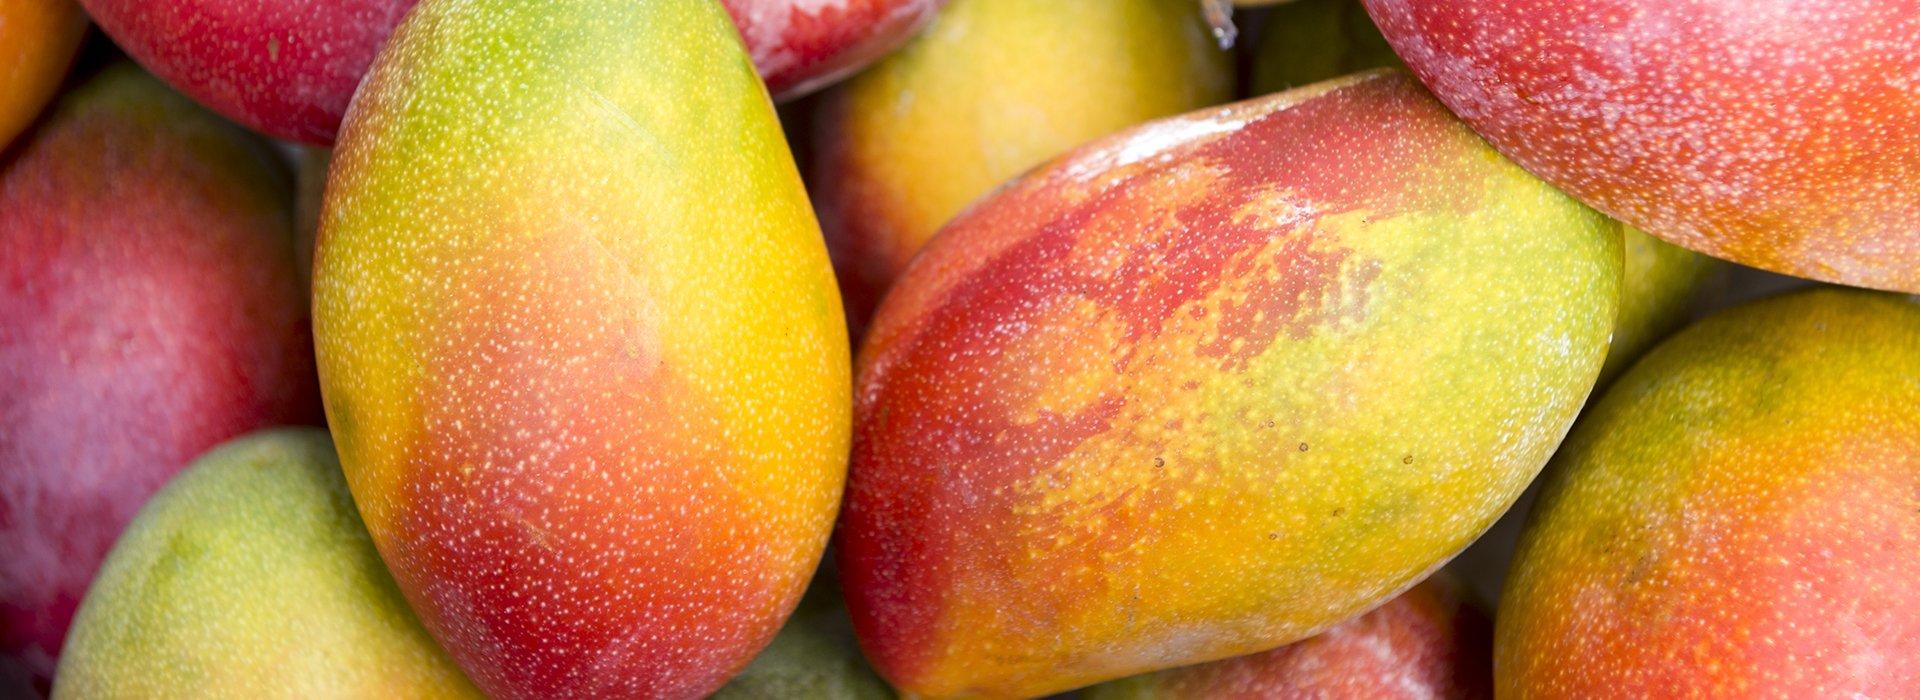 Photo of mangoes, ingredient of Grom ice cream